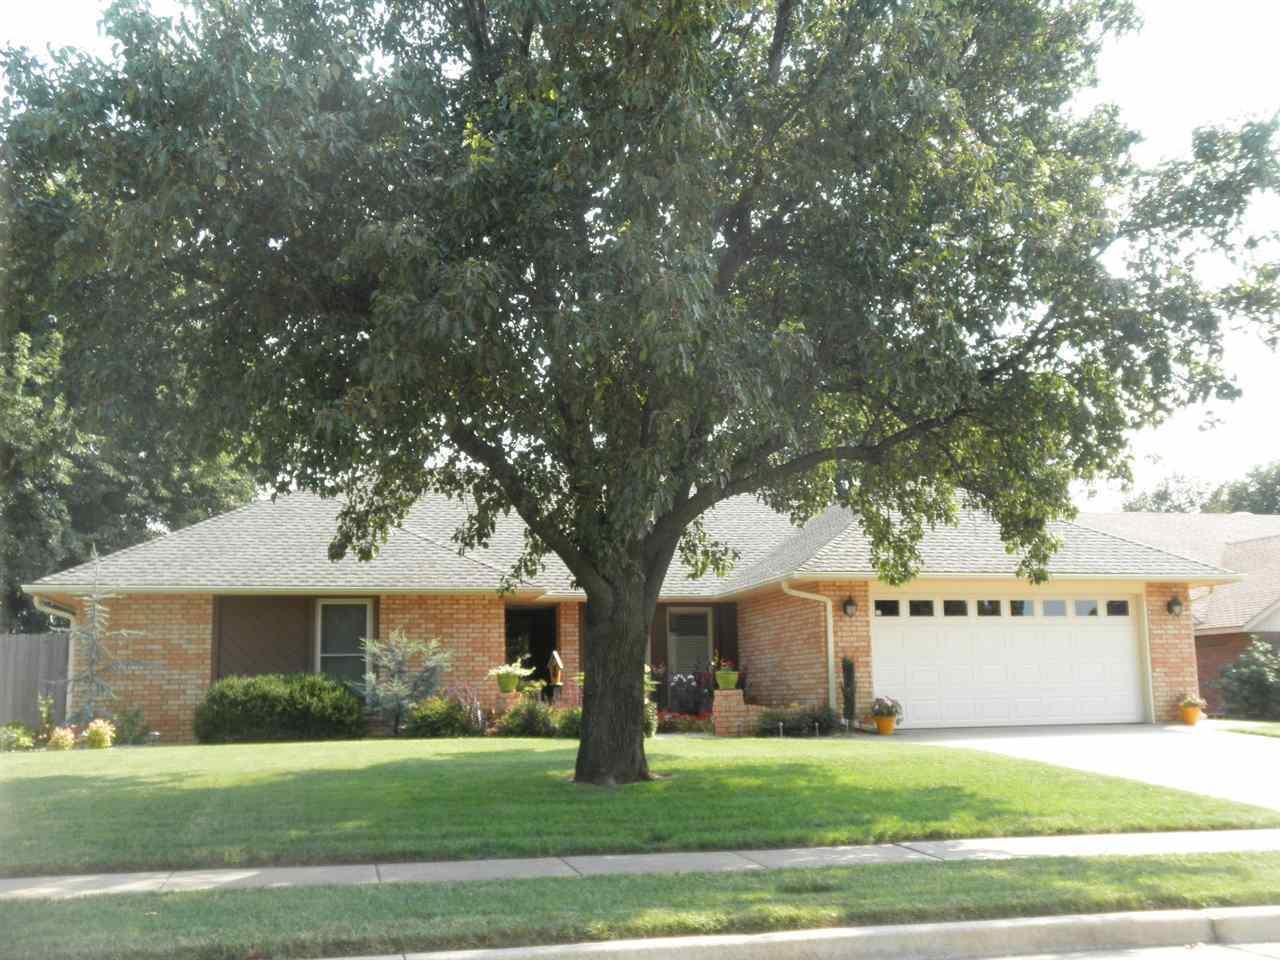 Sold Intraoffice W/MLS | 2316 Chapel Hill  Ponca City, OK 74604 0